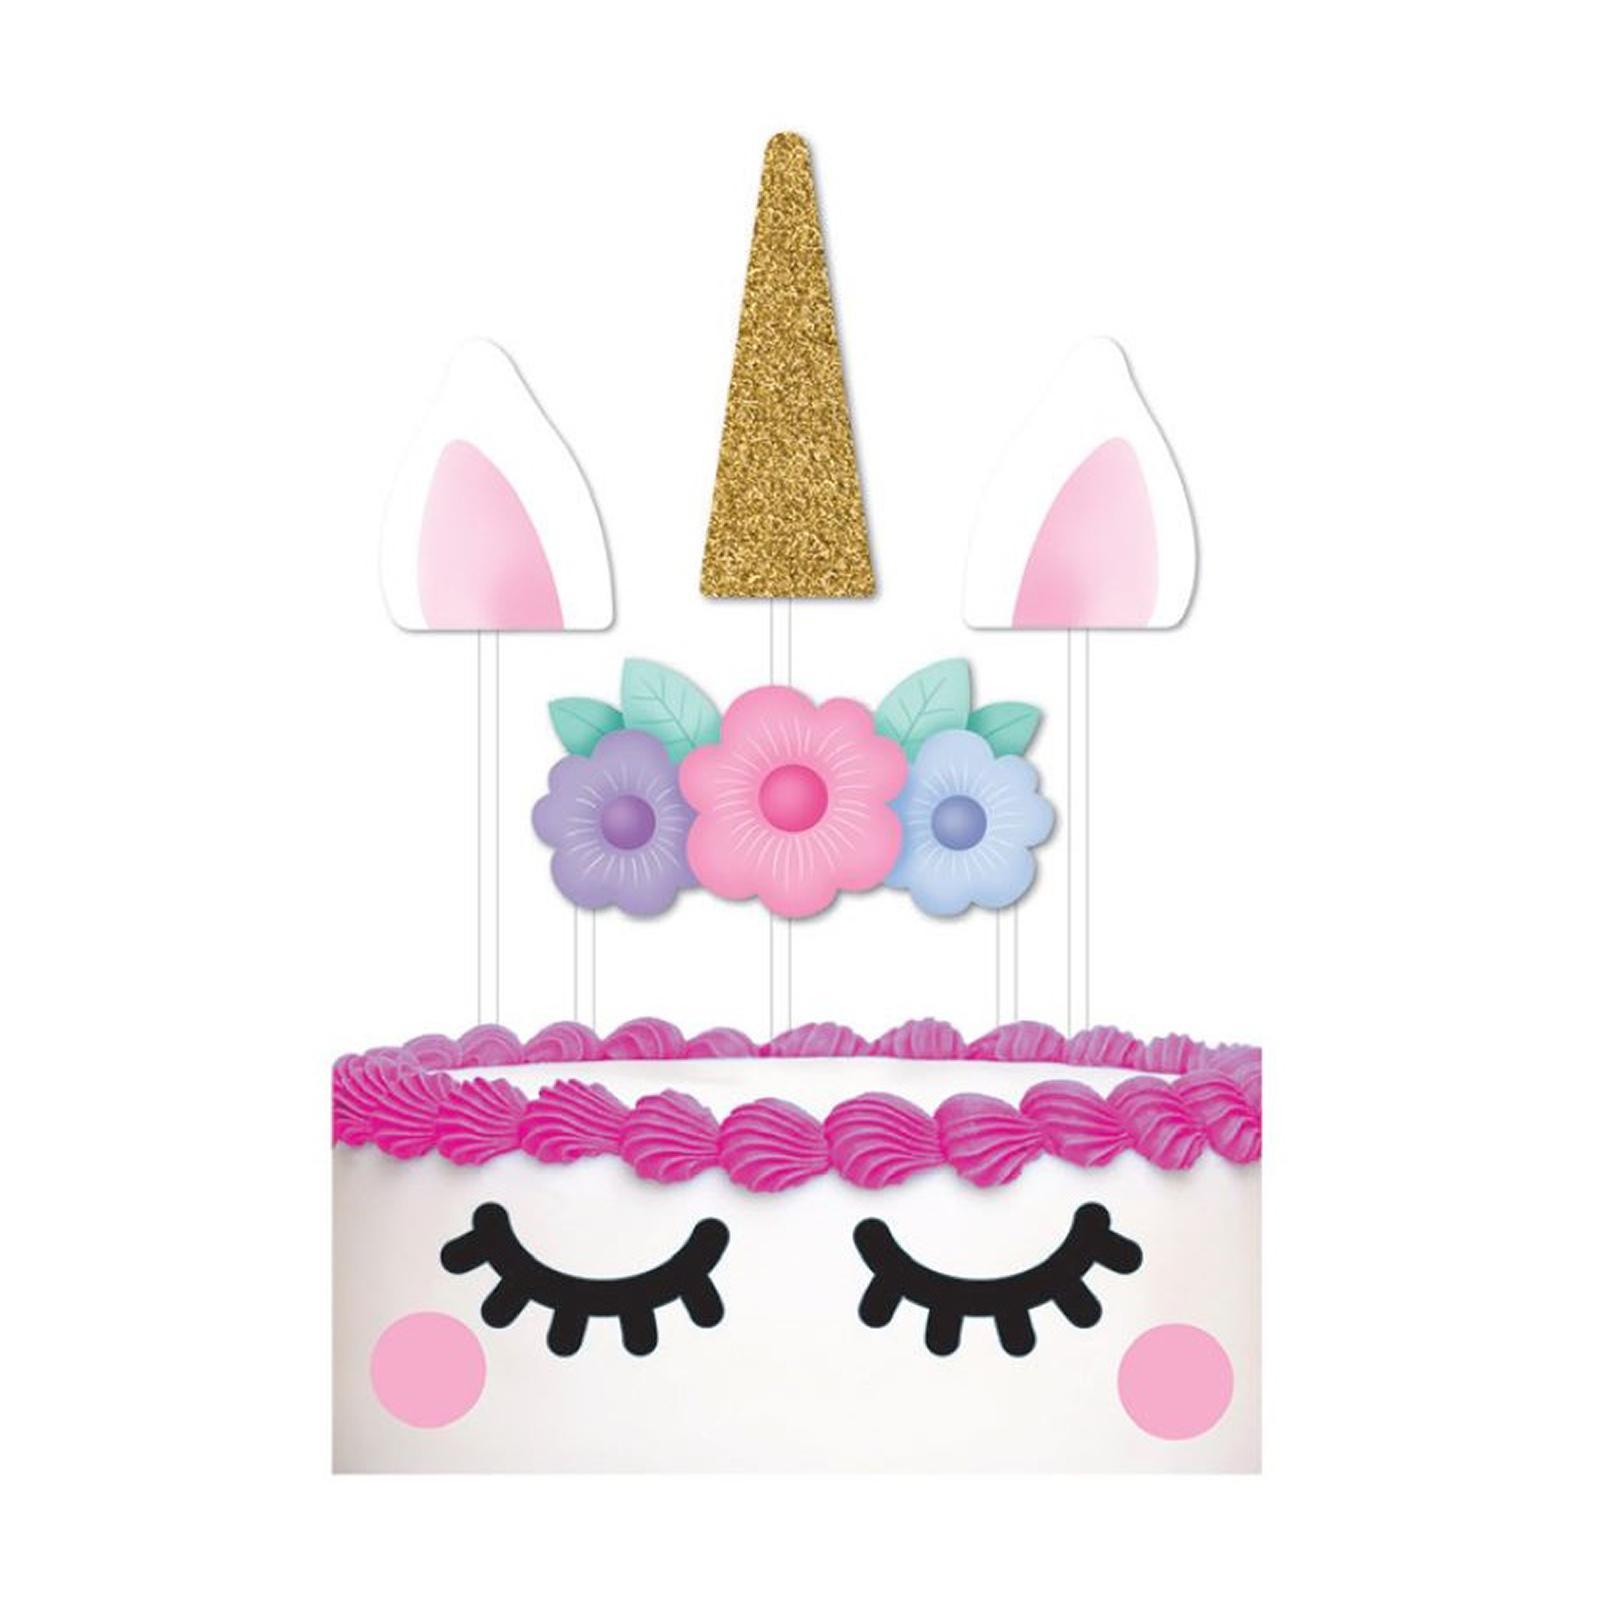 Artwrap Party Cake Topper Pack - Unicorn